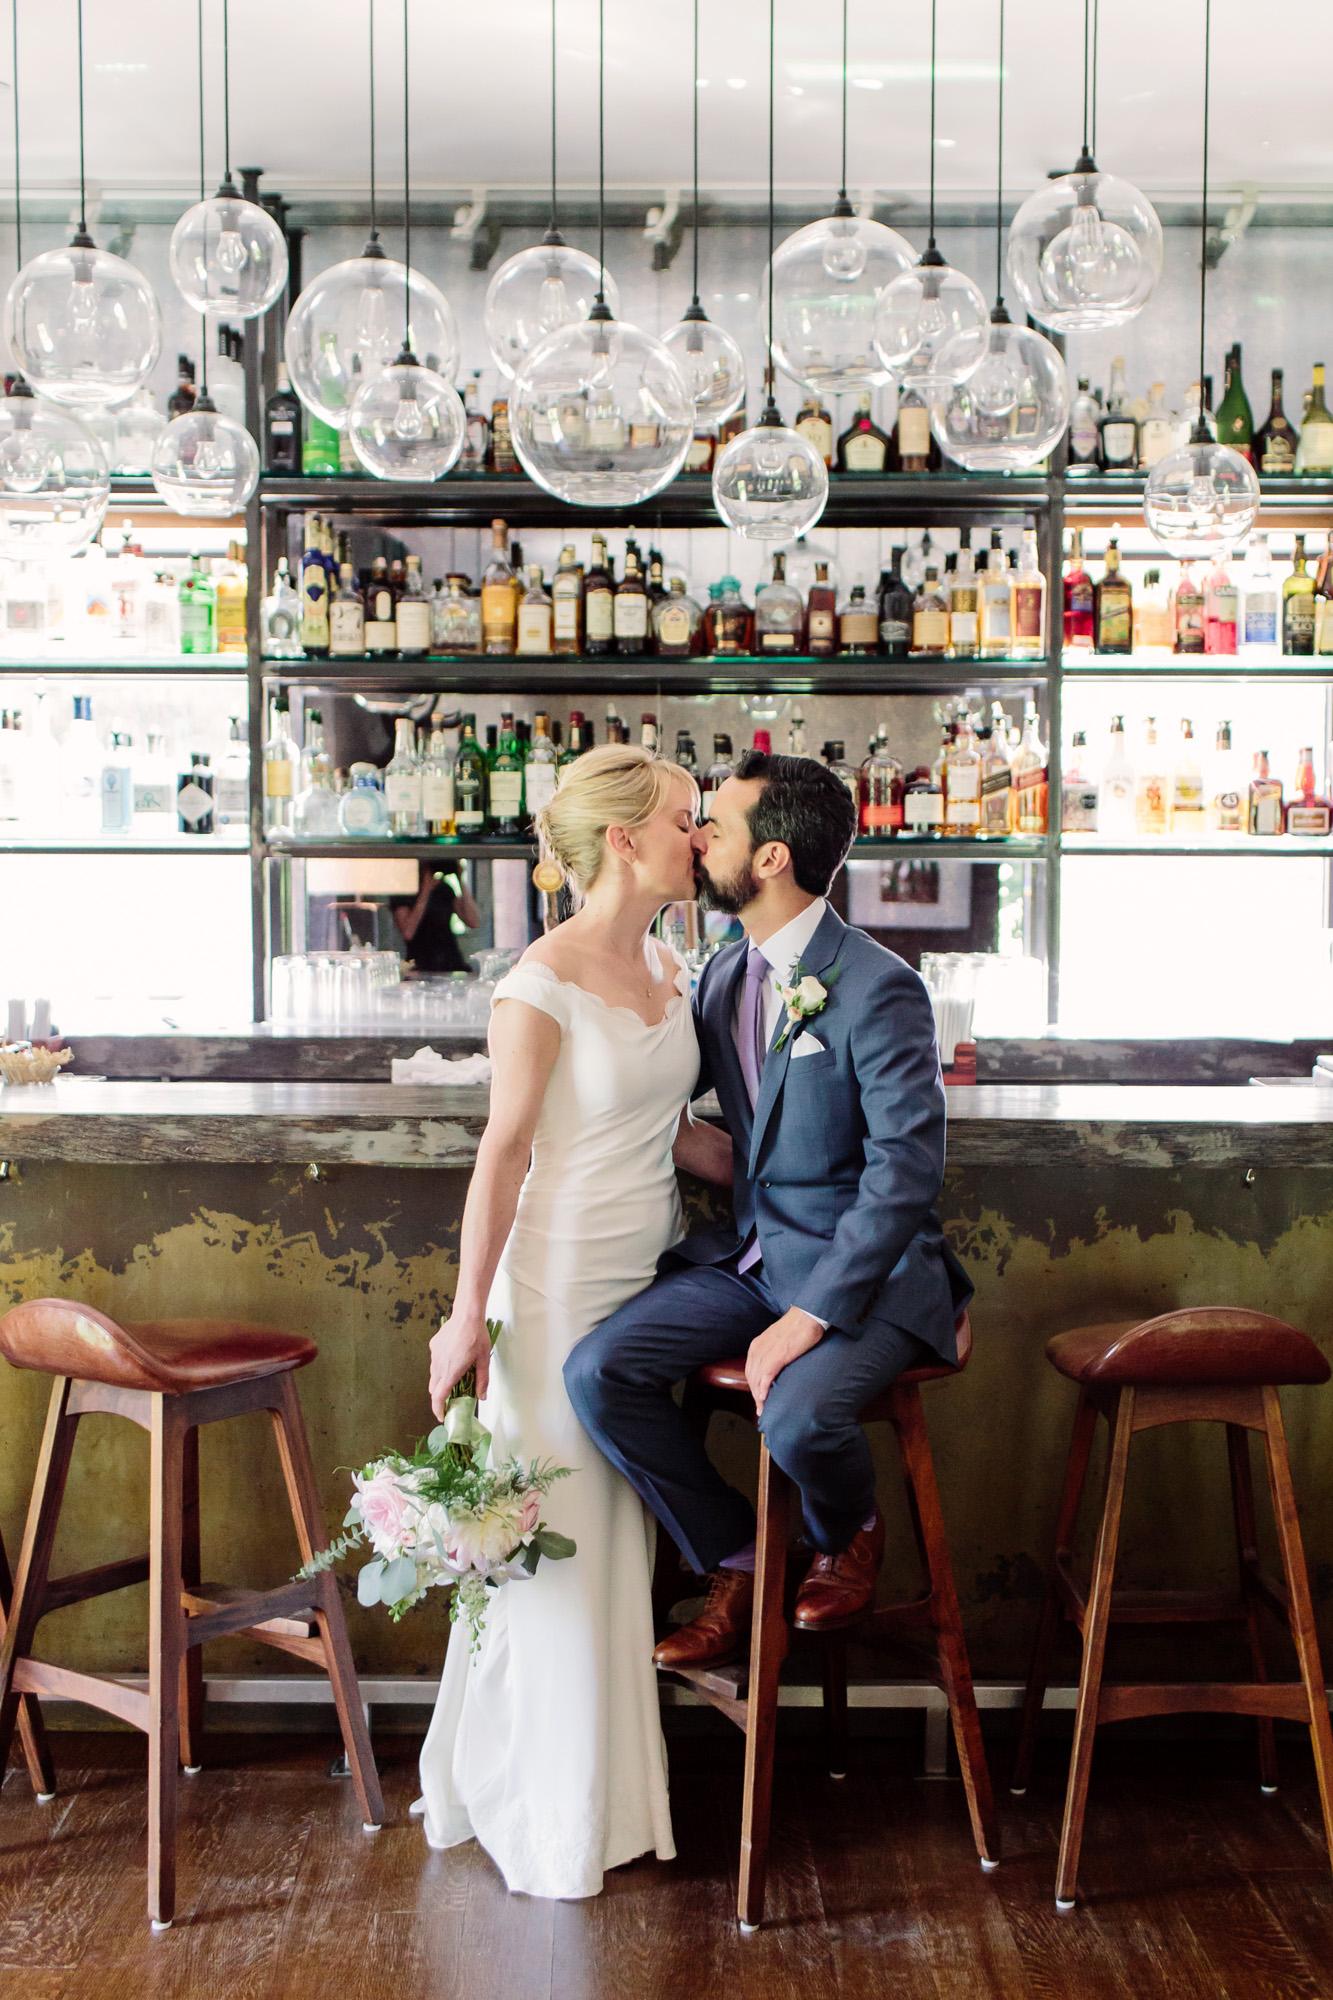 33_Rowan_Brian_The_Roundhouse_Wedding_Beacon_NY_Tanya_Salazar_Photography_247.jpg